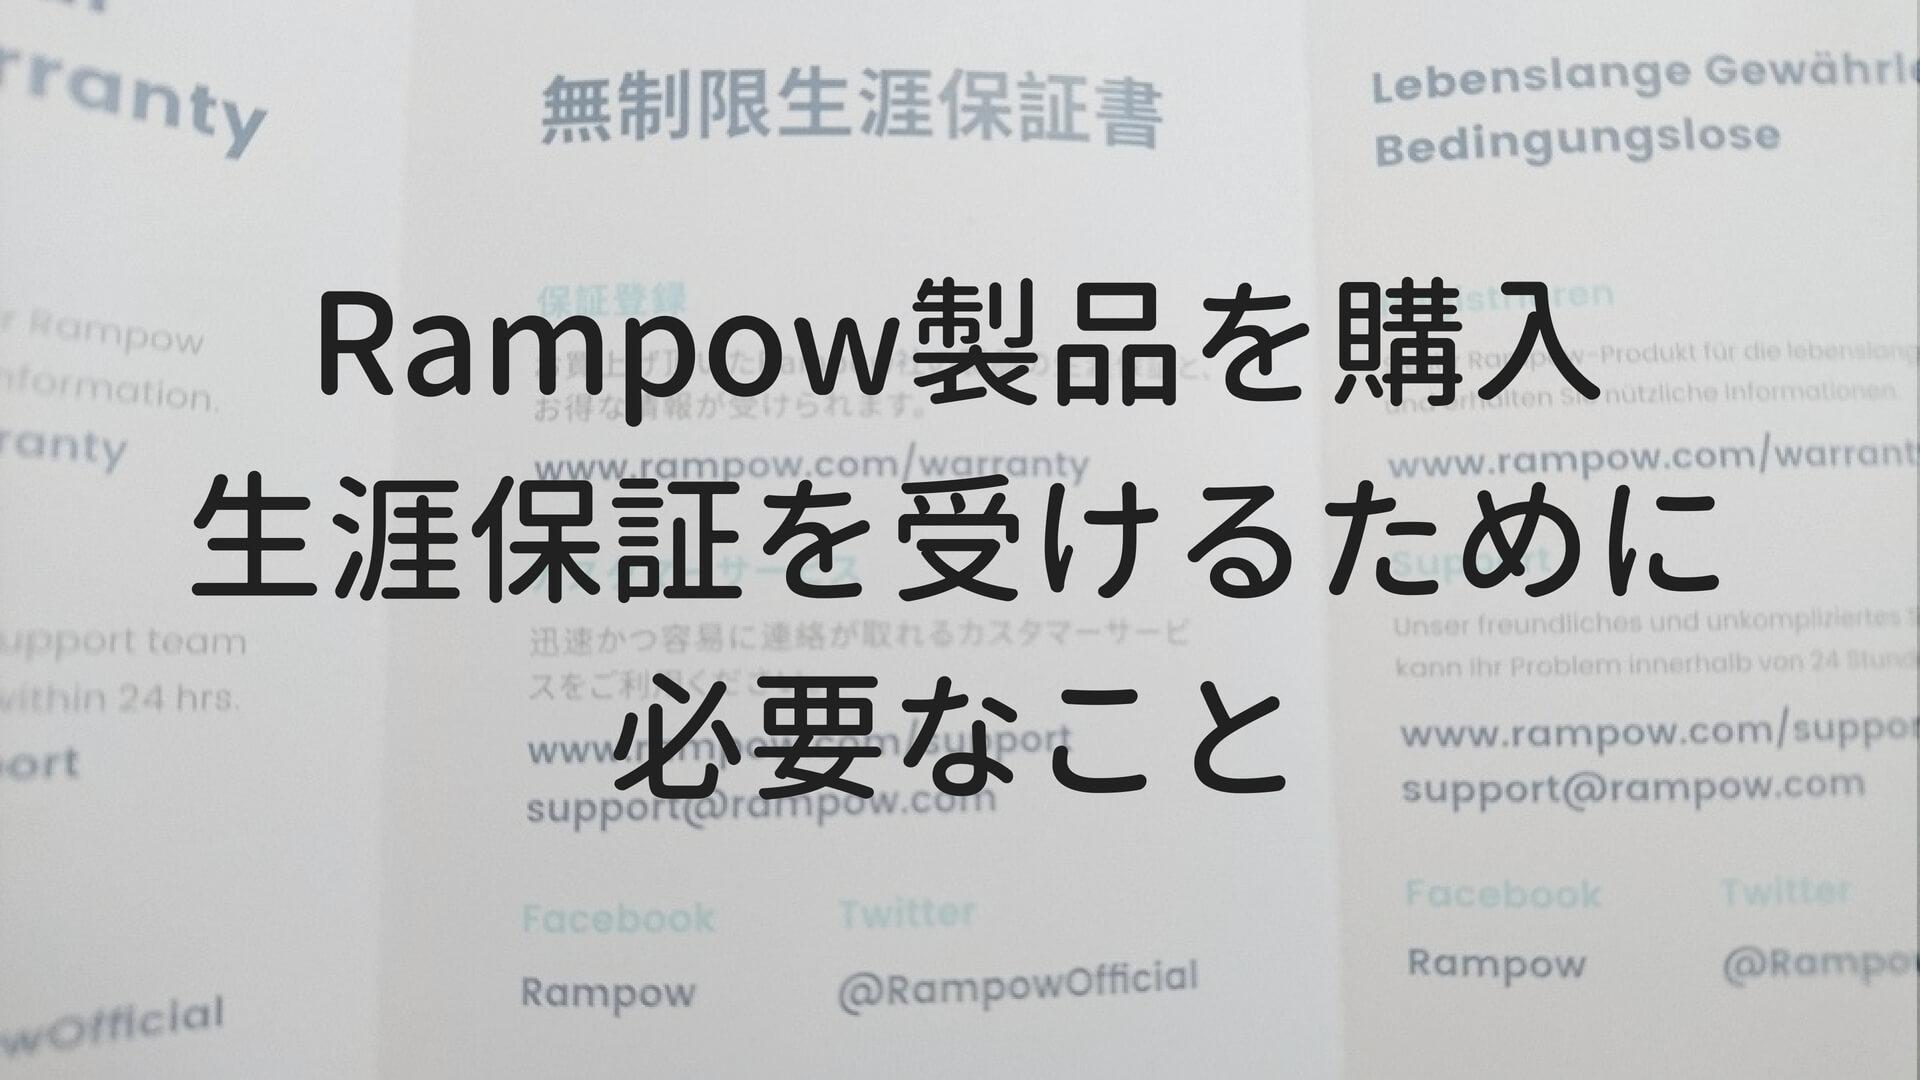 Rampow製品の生涯保証アイキャッチ